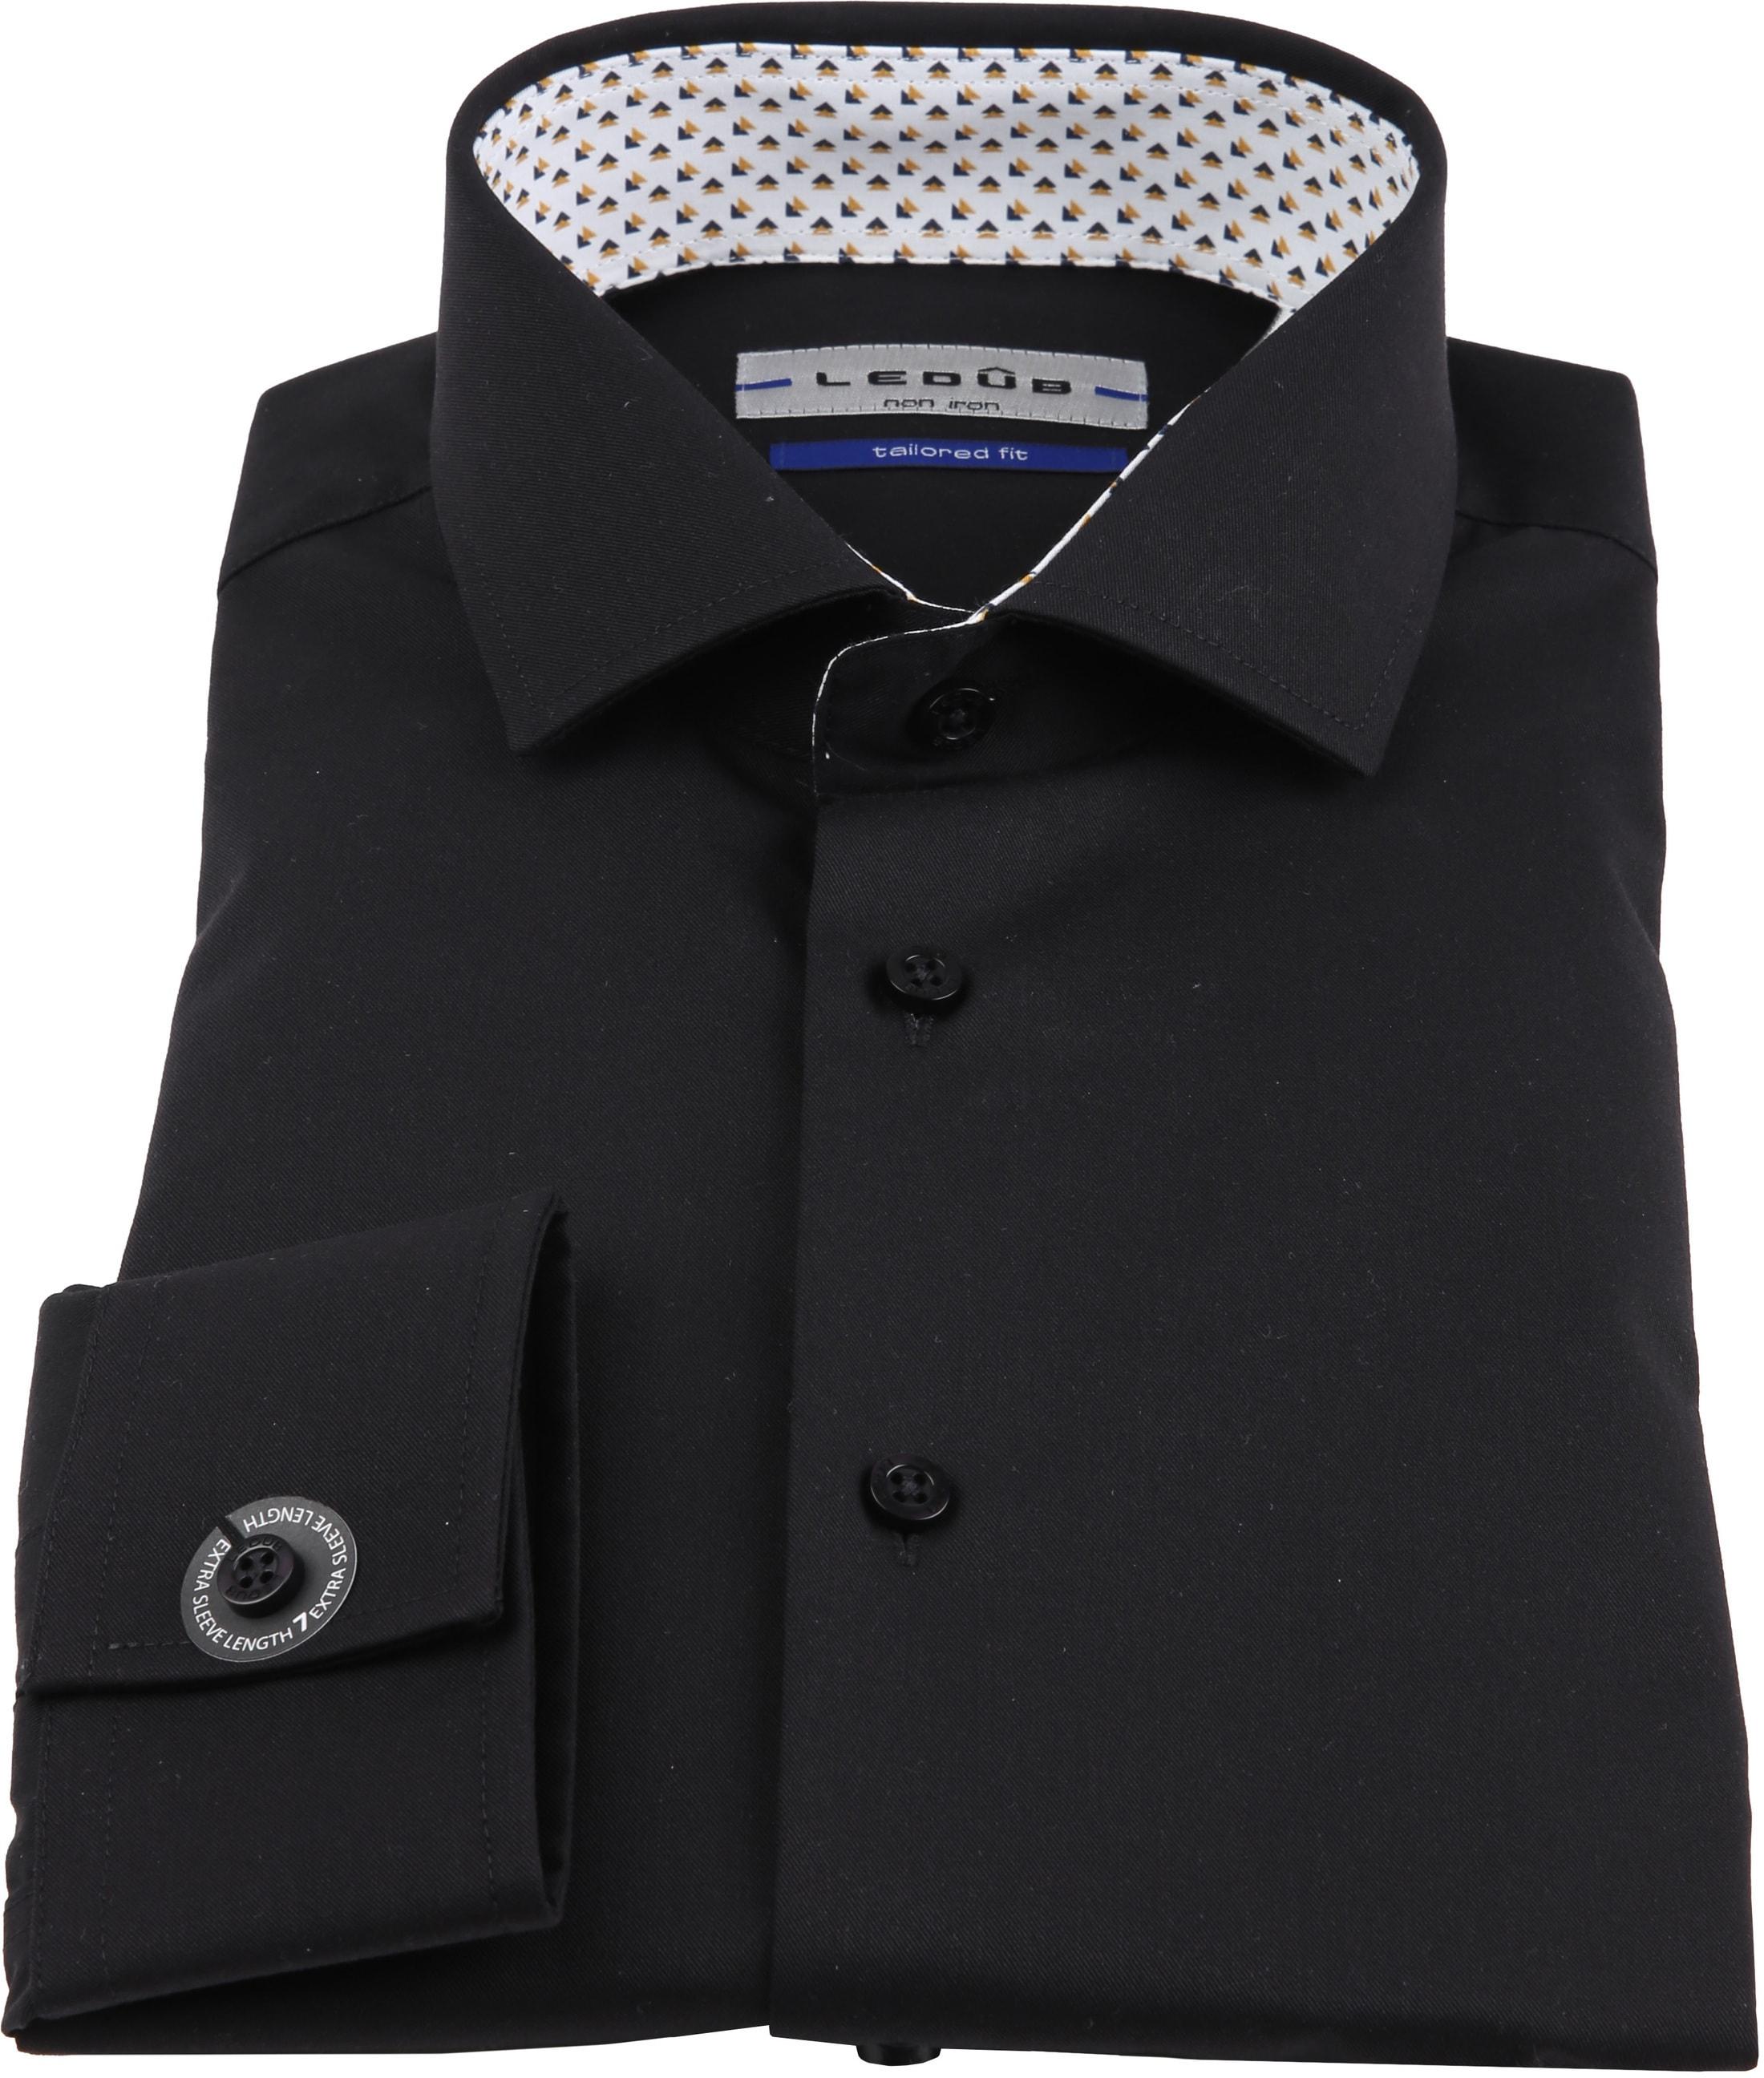 Ledub Overhemd Strijkvrij Zwart foto 2